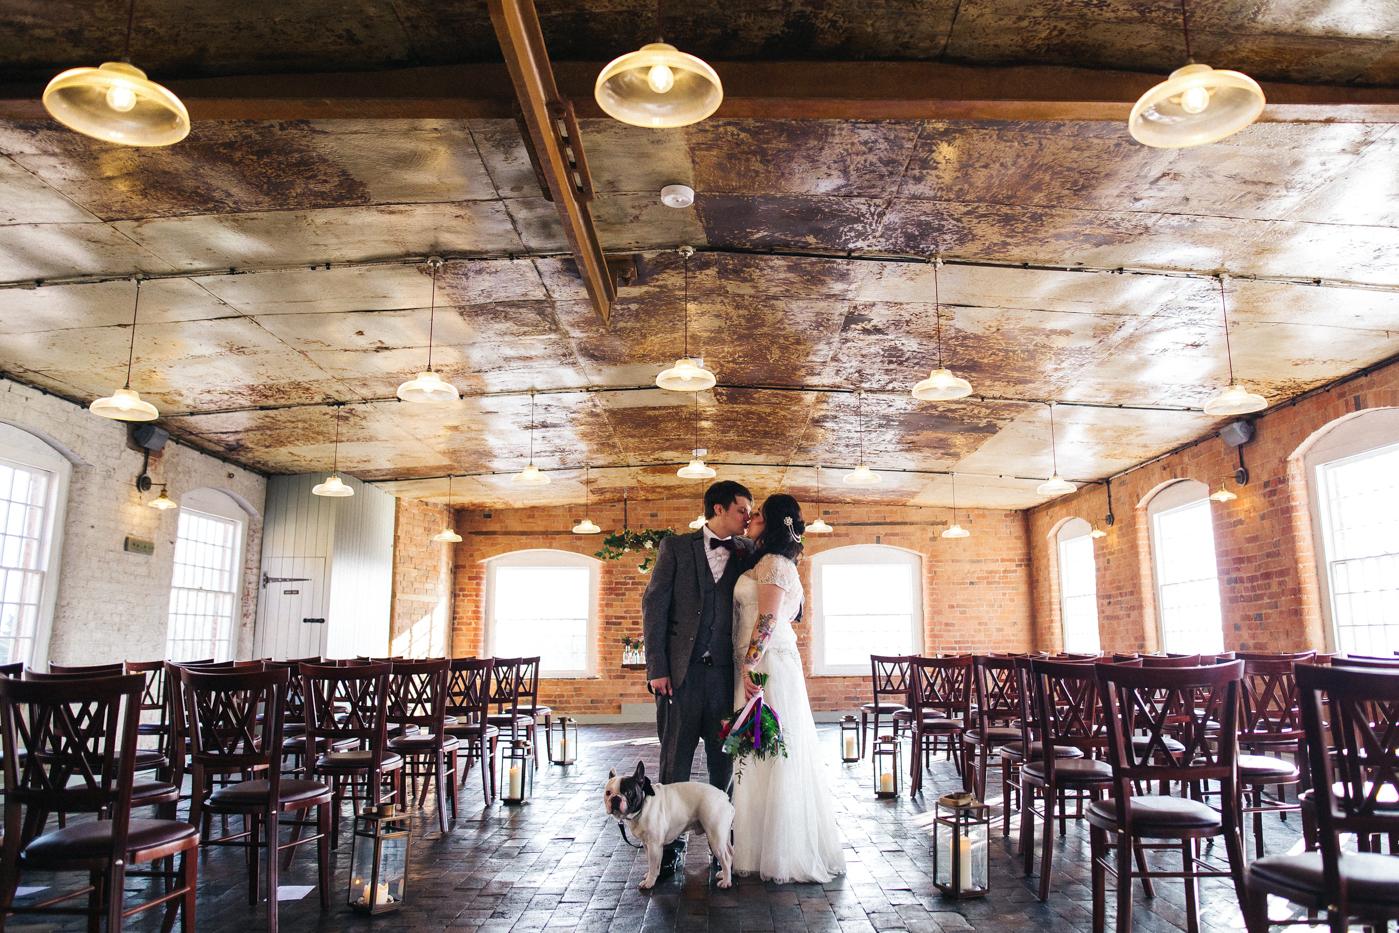 teesside-middlesbrough-north-east-wedding-photographer-creative-wedding-venues-0038.jpg